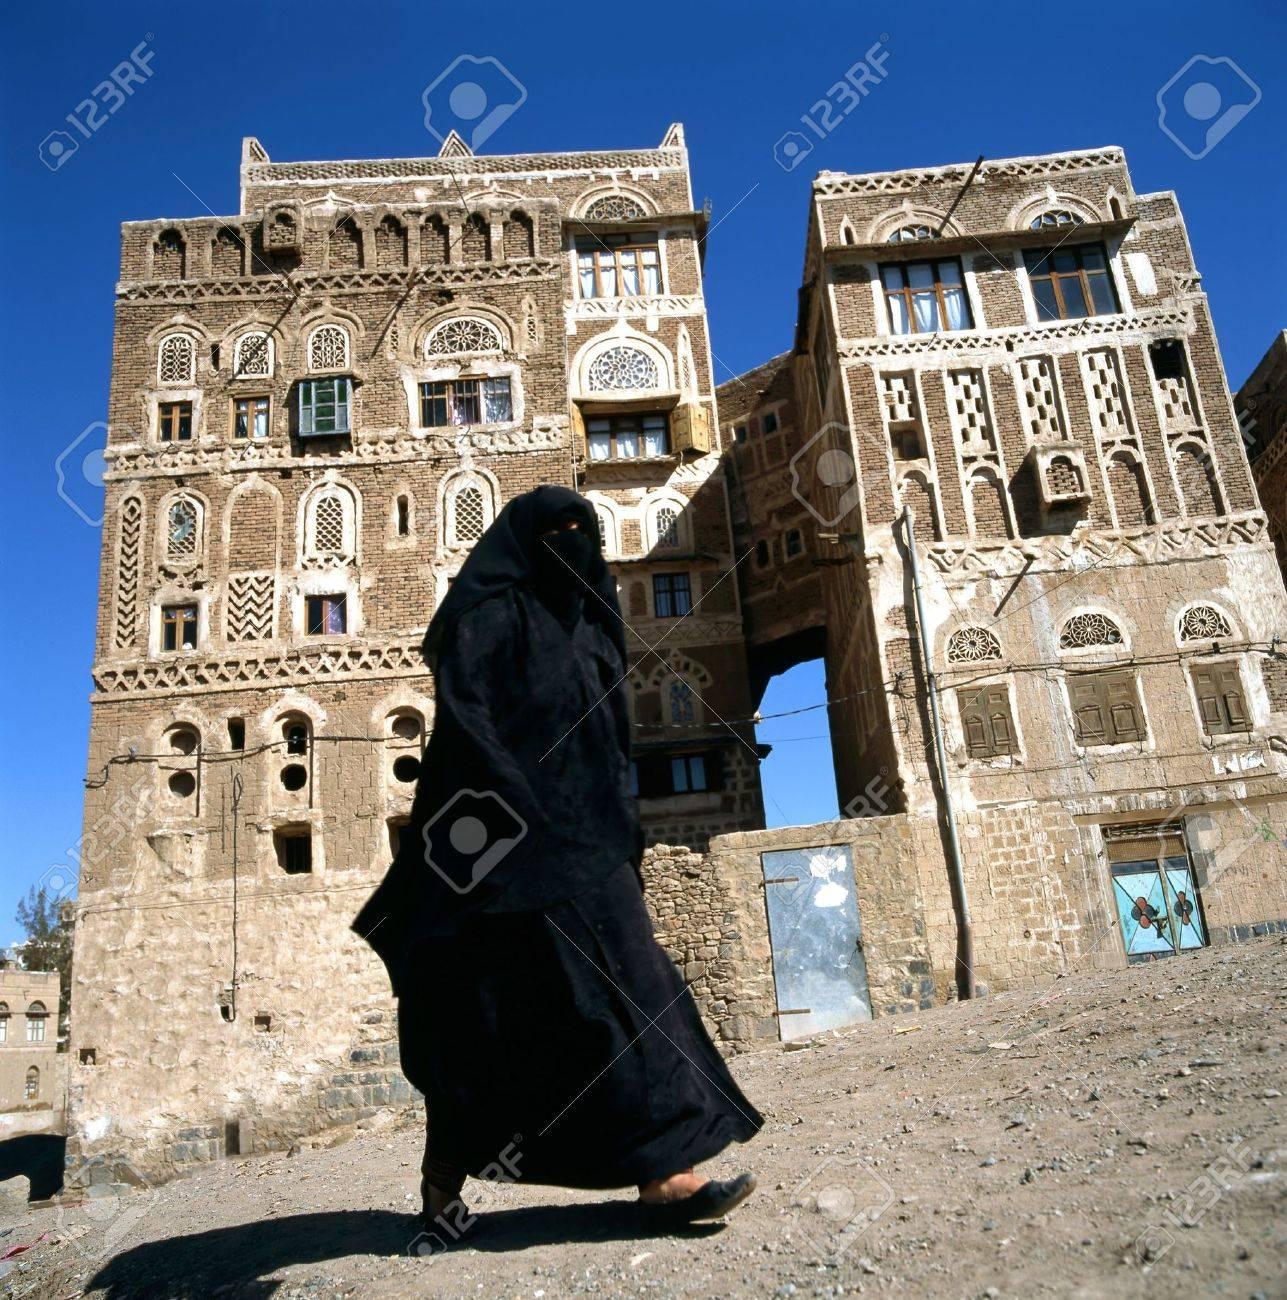 A veiled Muslim woman walks on a Sanaa street, Yemen.At background typical Yemen houses. - 6198594